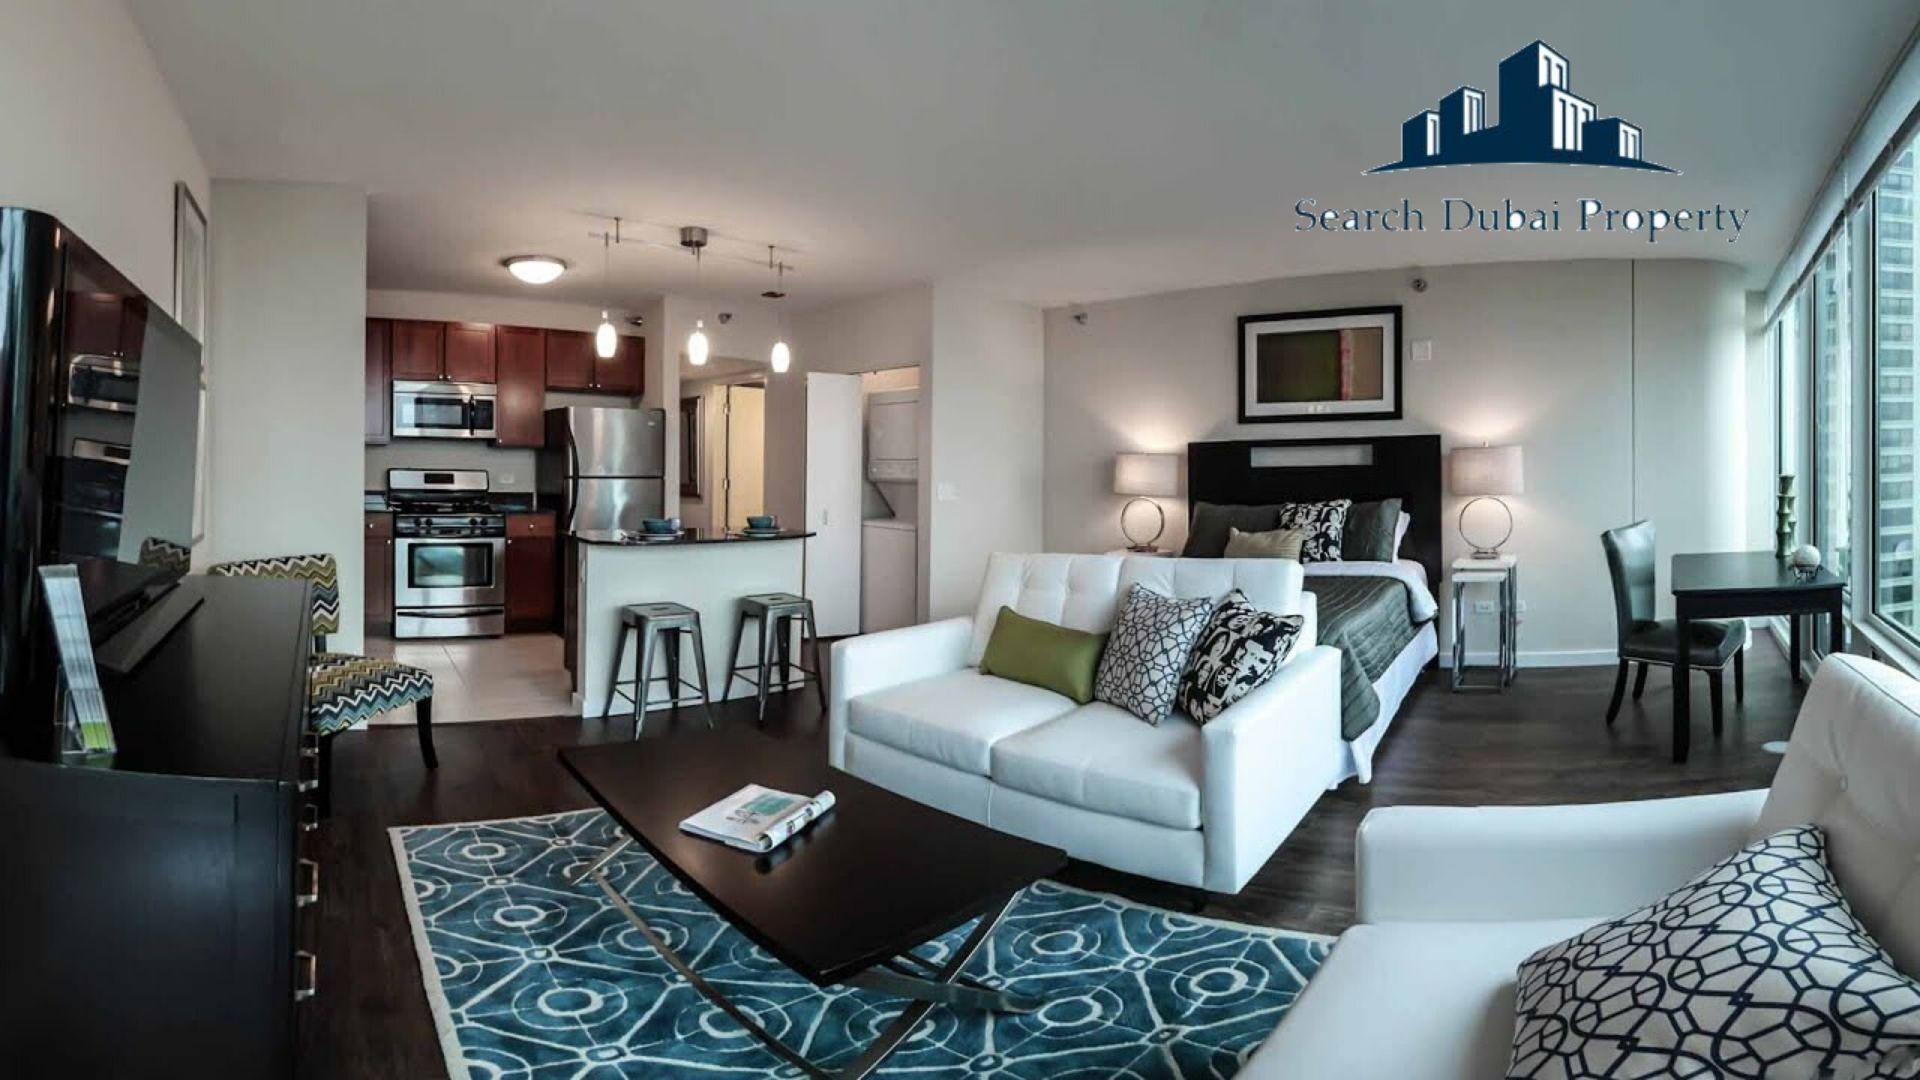 Apartments For Sale In Dubai Apartment Interior Luxury Apartments Interior Interior Decoration Bedroom